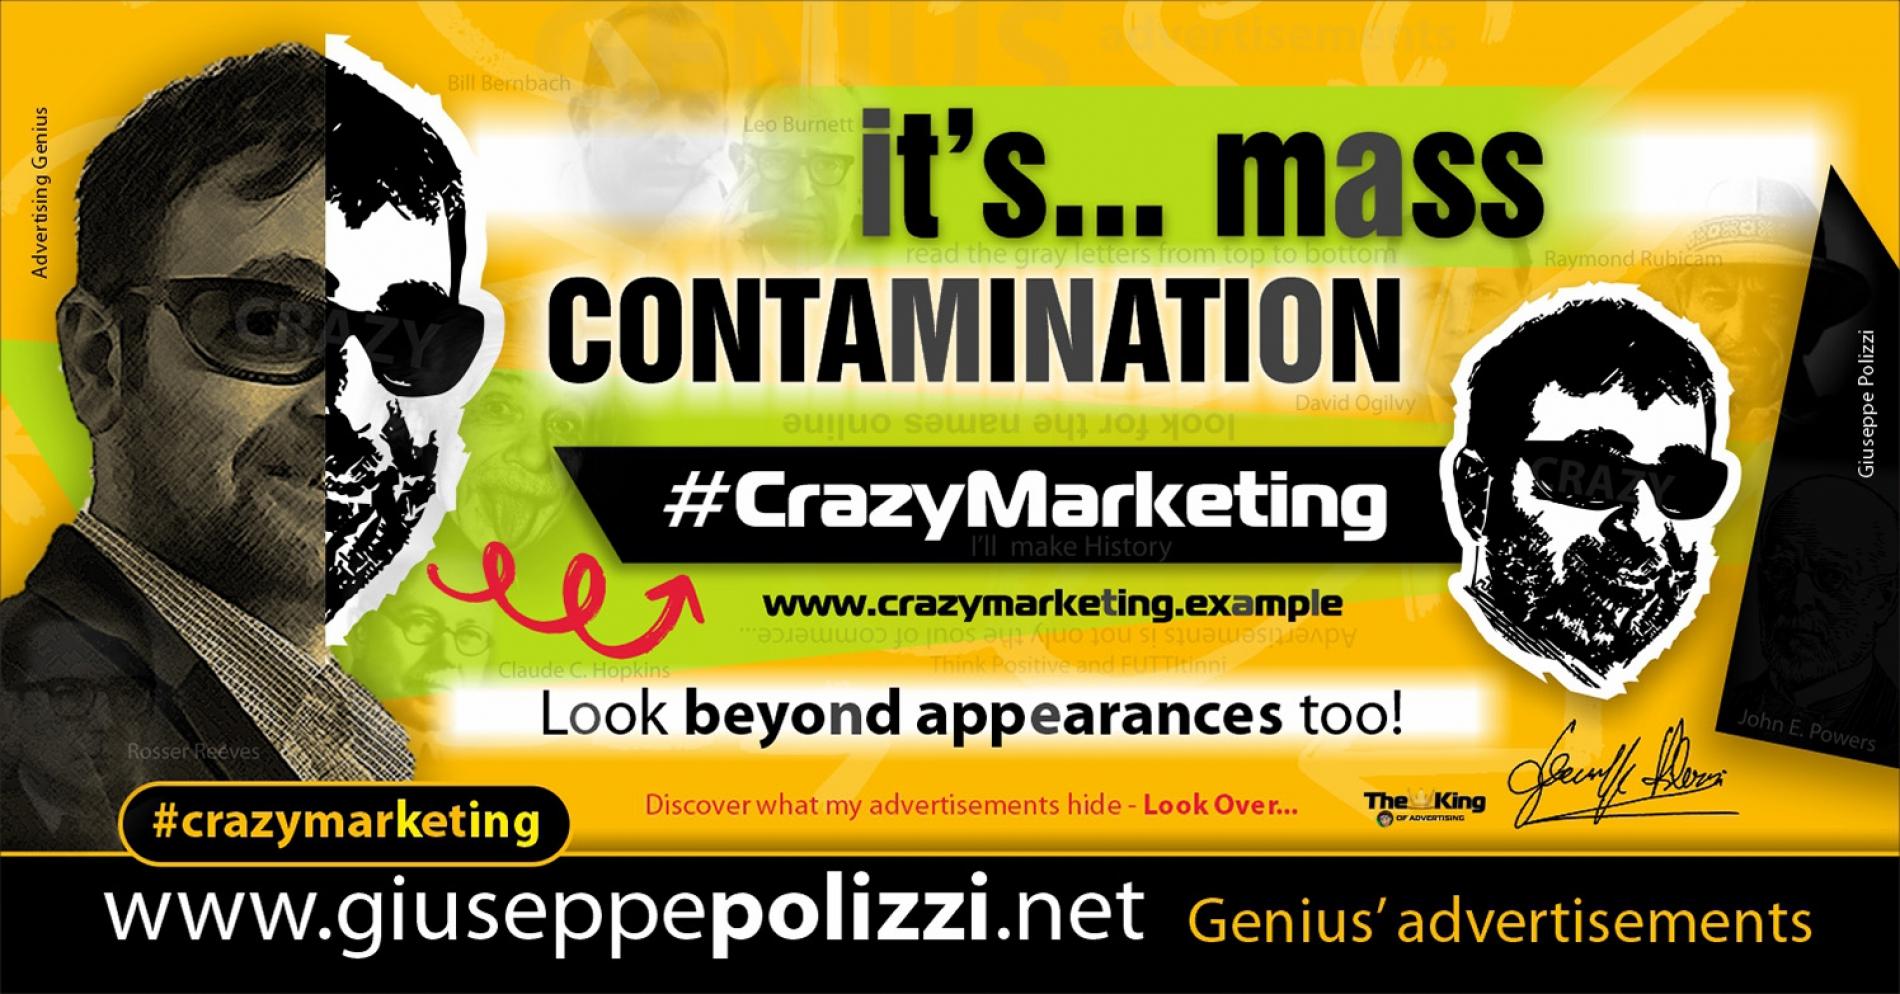 giuseppe polizzi advertising Contamination Crazy Marketing  2020